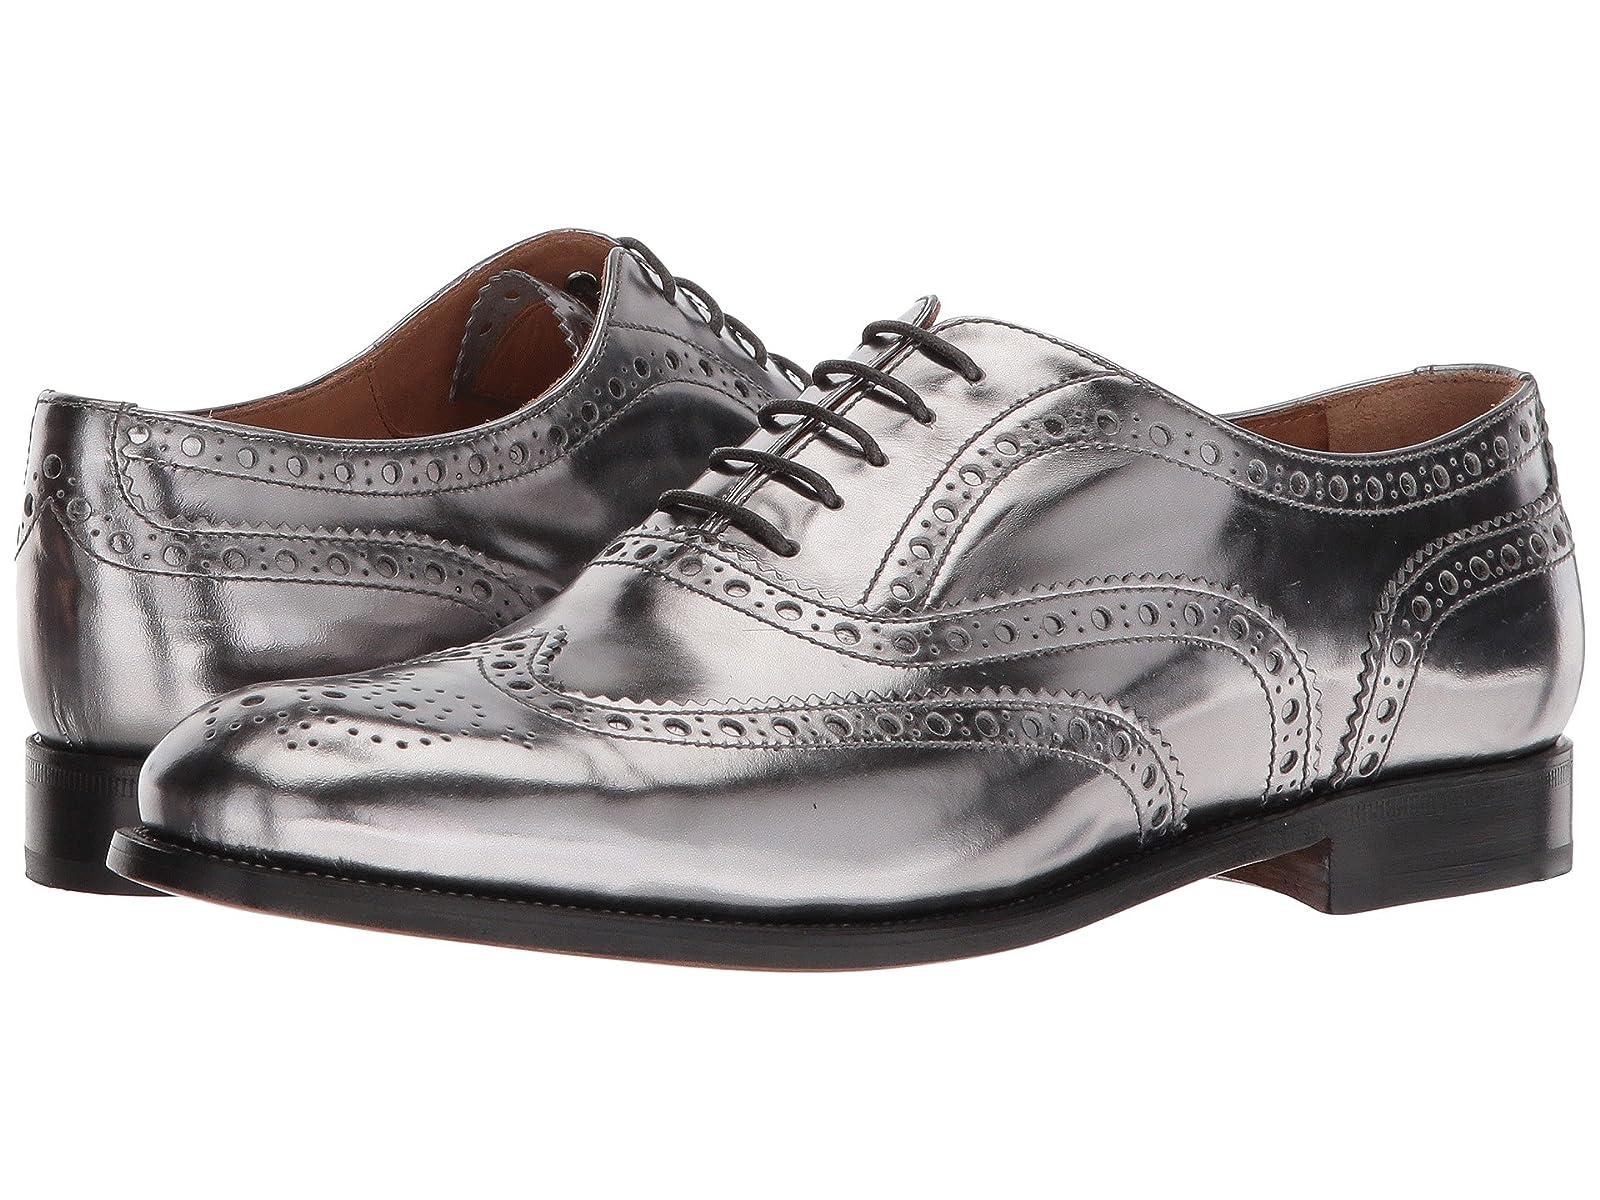 Church's Burwood Wing Tip OxfordAtmospheric grades have affordable shoes